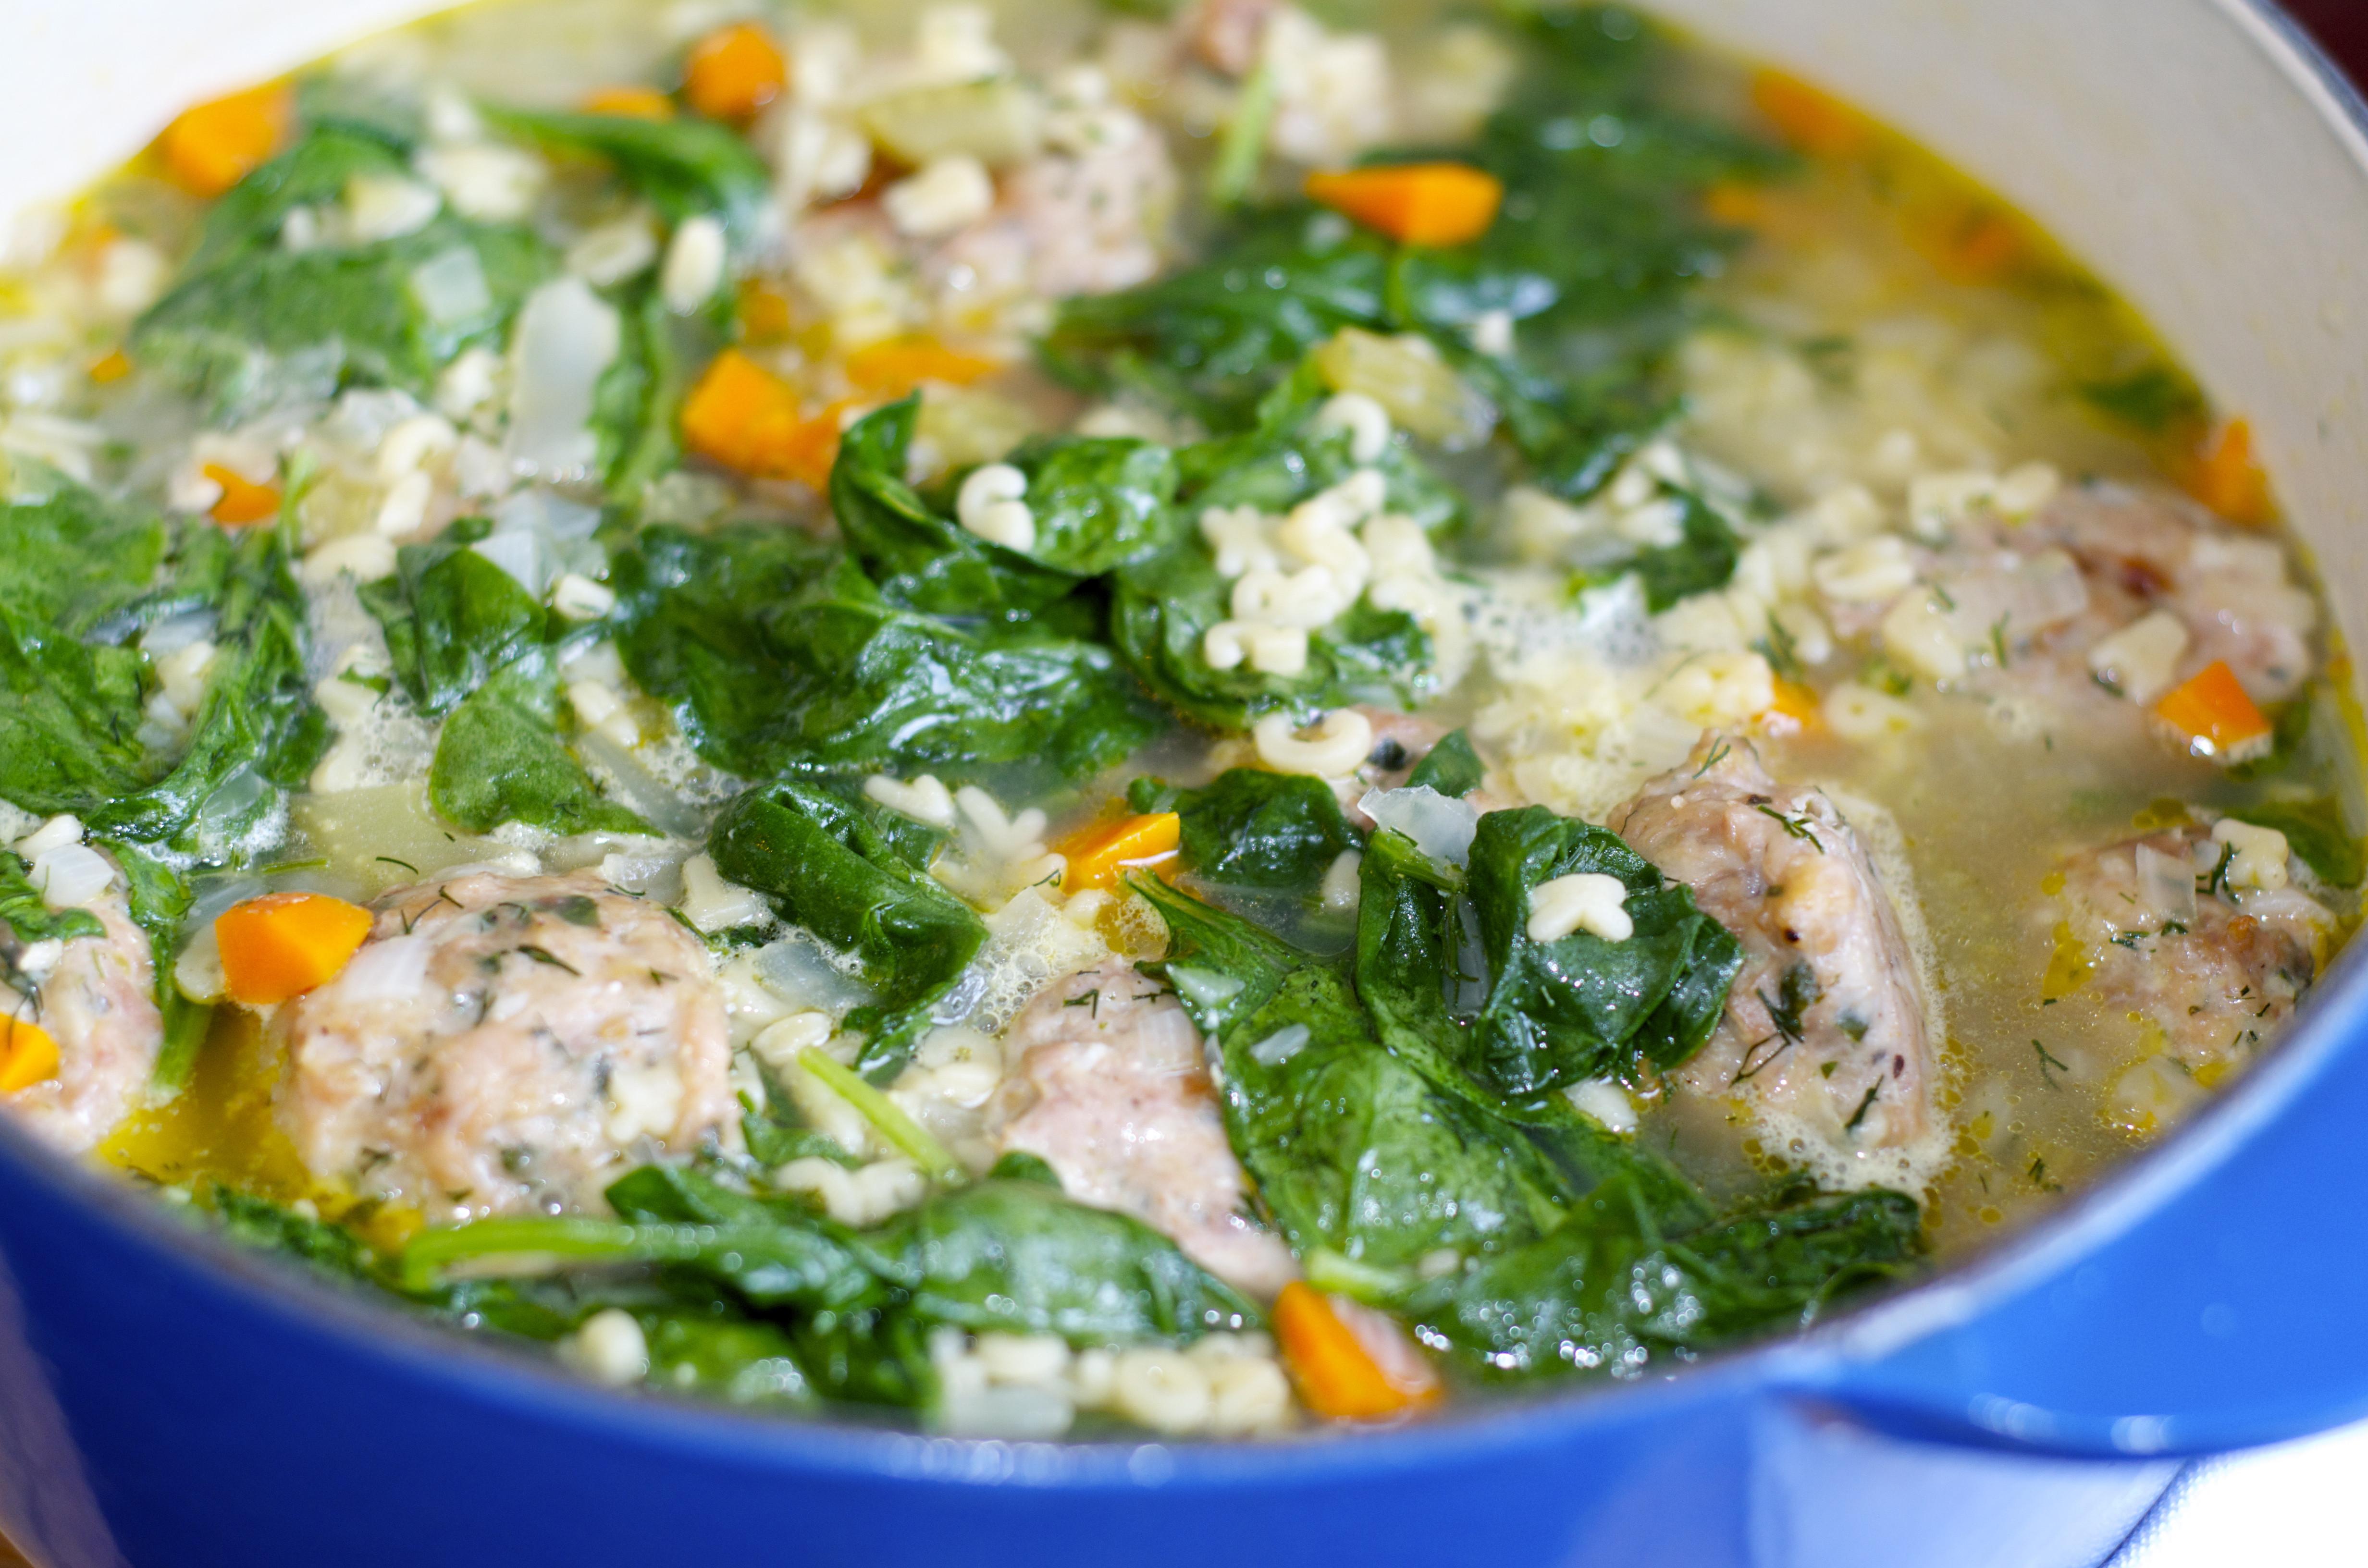 Italian Wedding Soup With Chicken  Italian Wedding Soup pulsive Foo